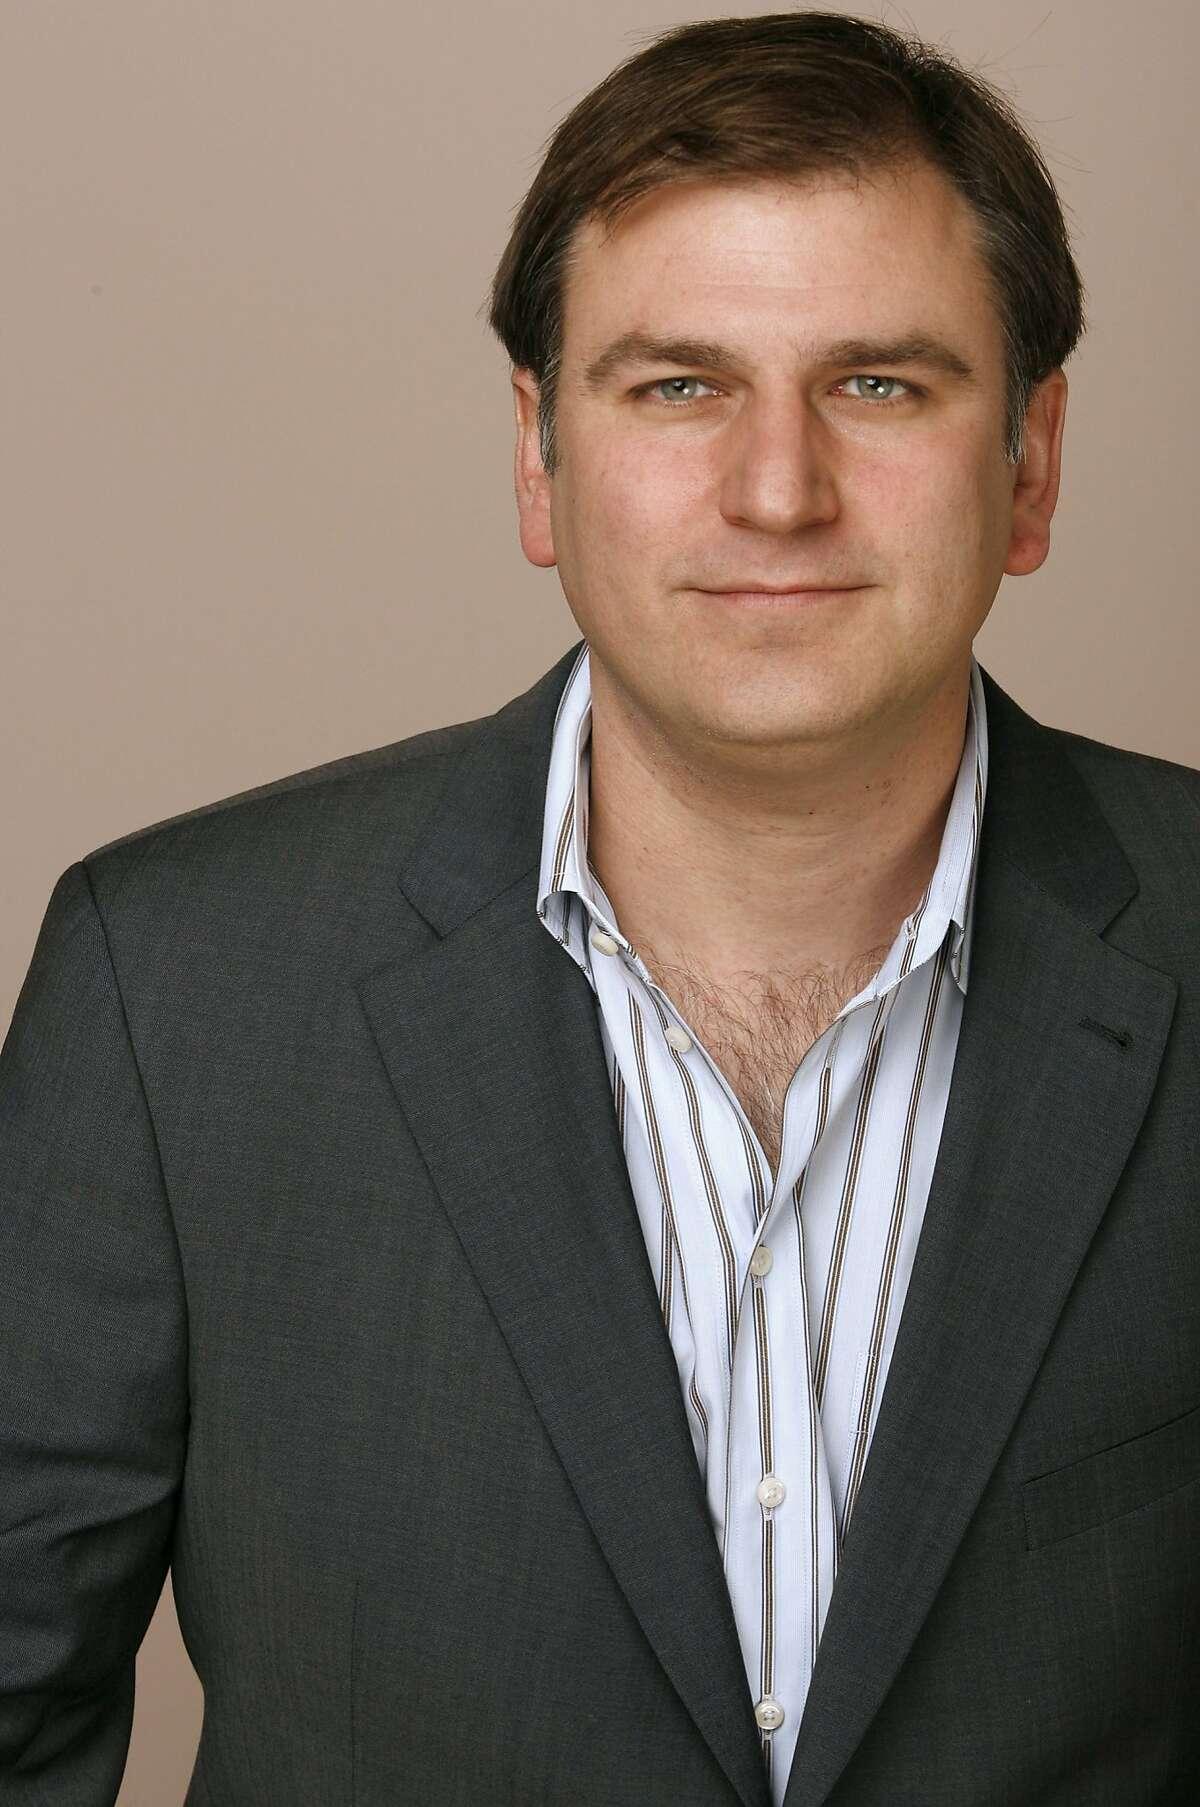 Noah Cowan has been named the new executive director of the San Francisco Film Society.